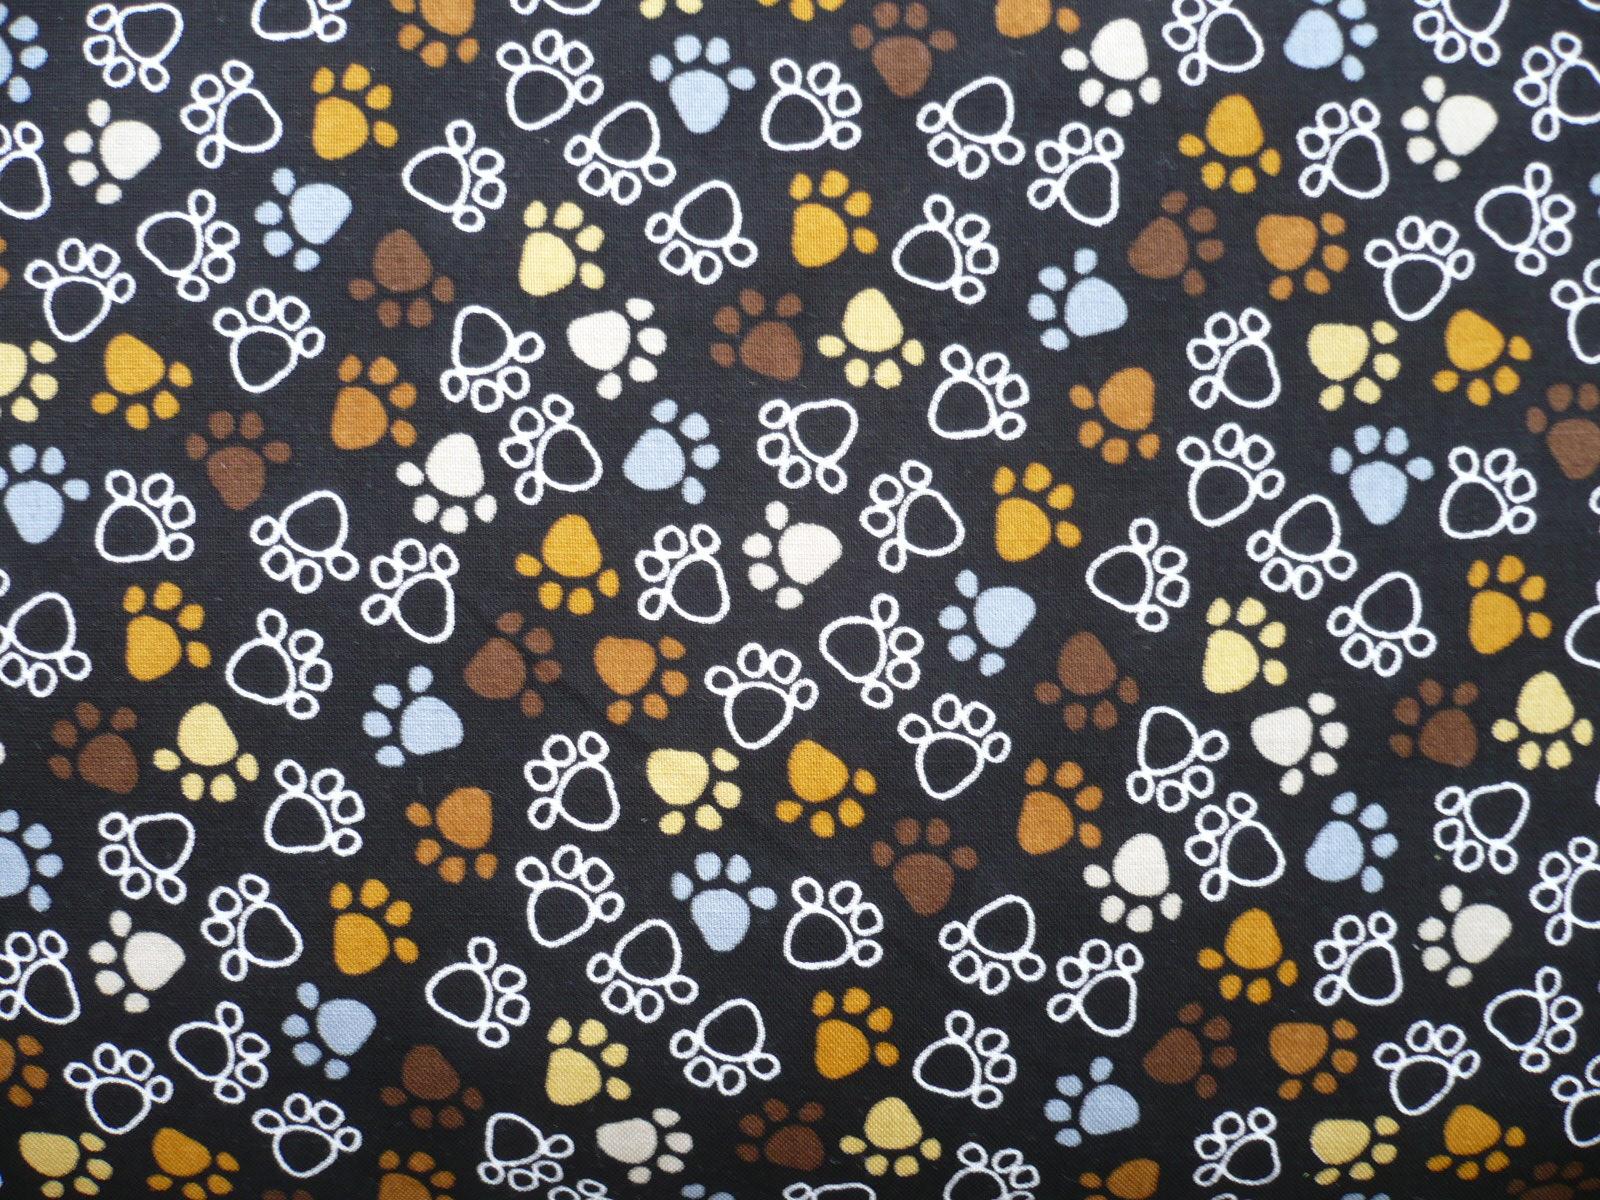 paw print bones wallpaper - photo #18